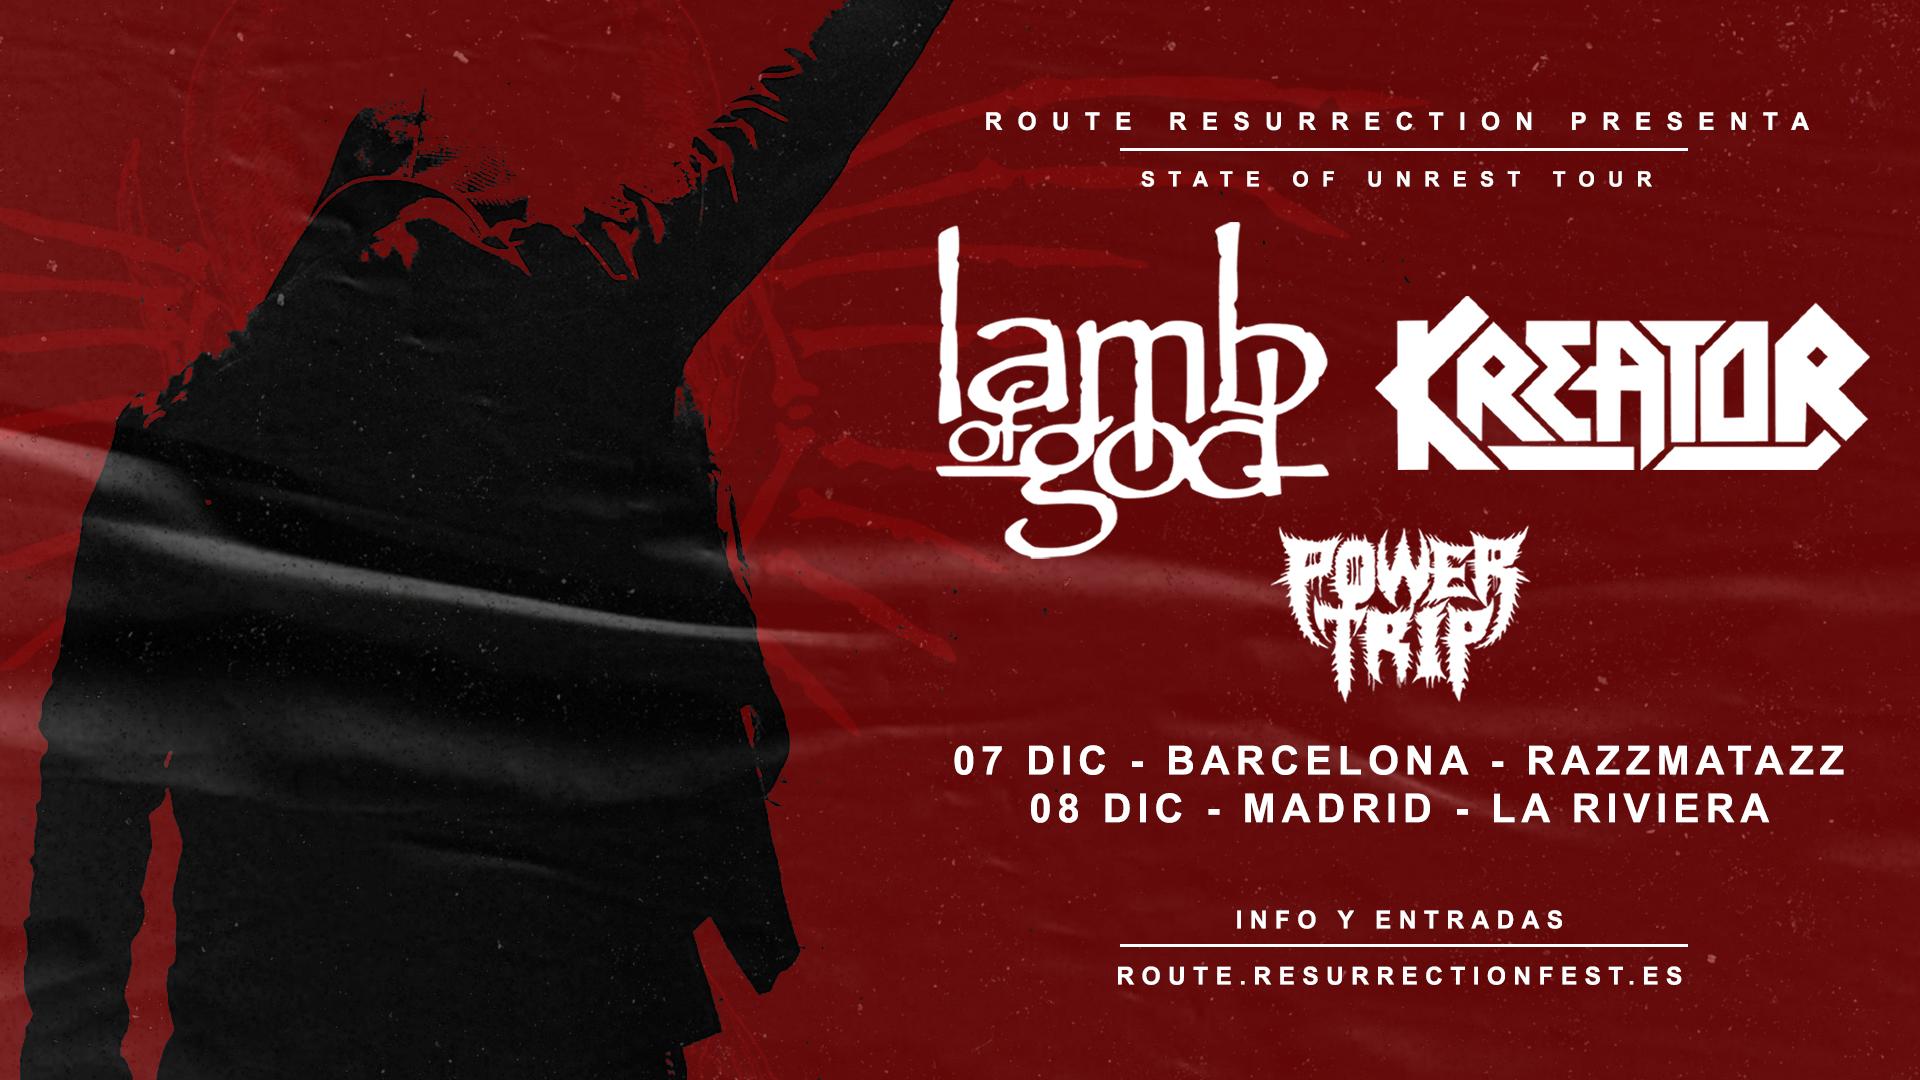 Route Resurrection Fest 2021 - Lamb of God - Kreator - Event